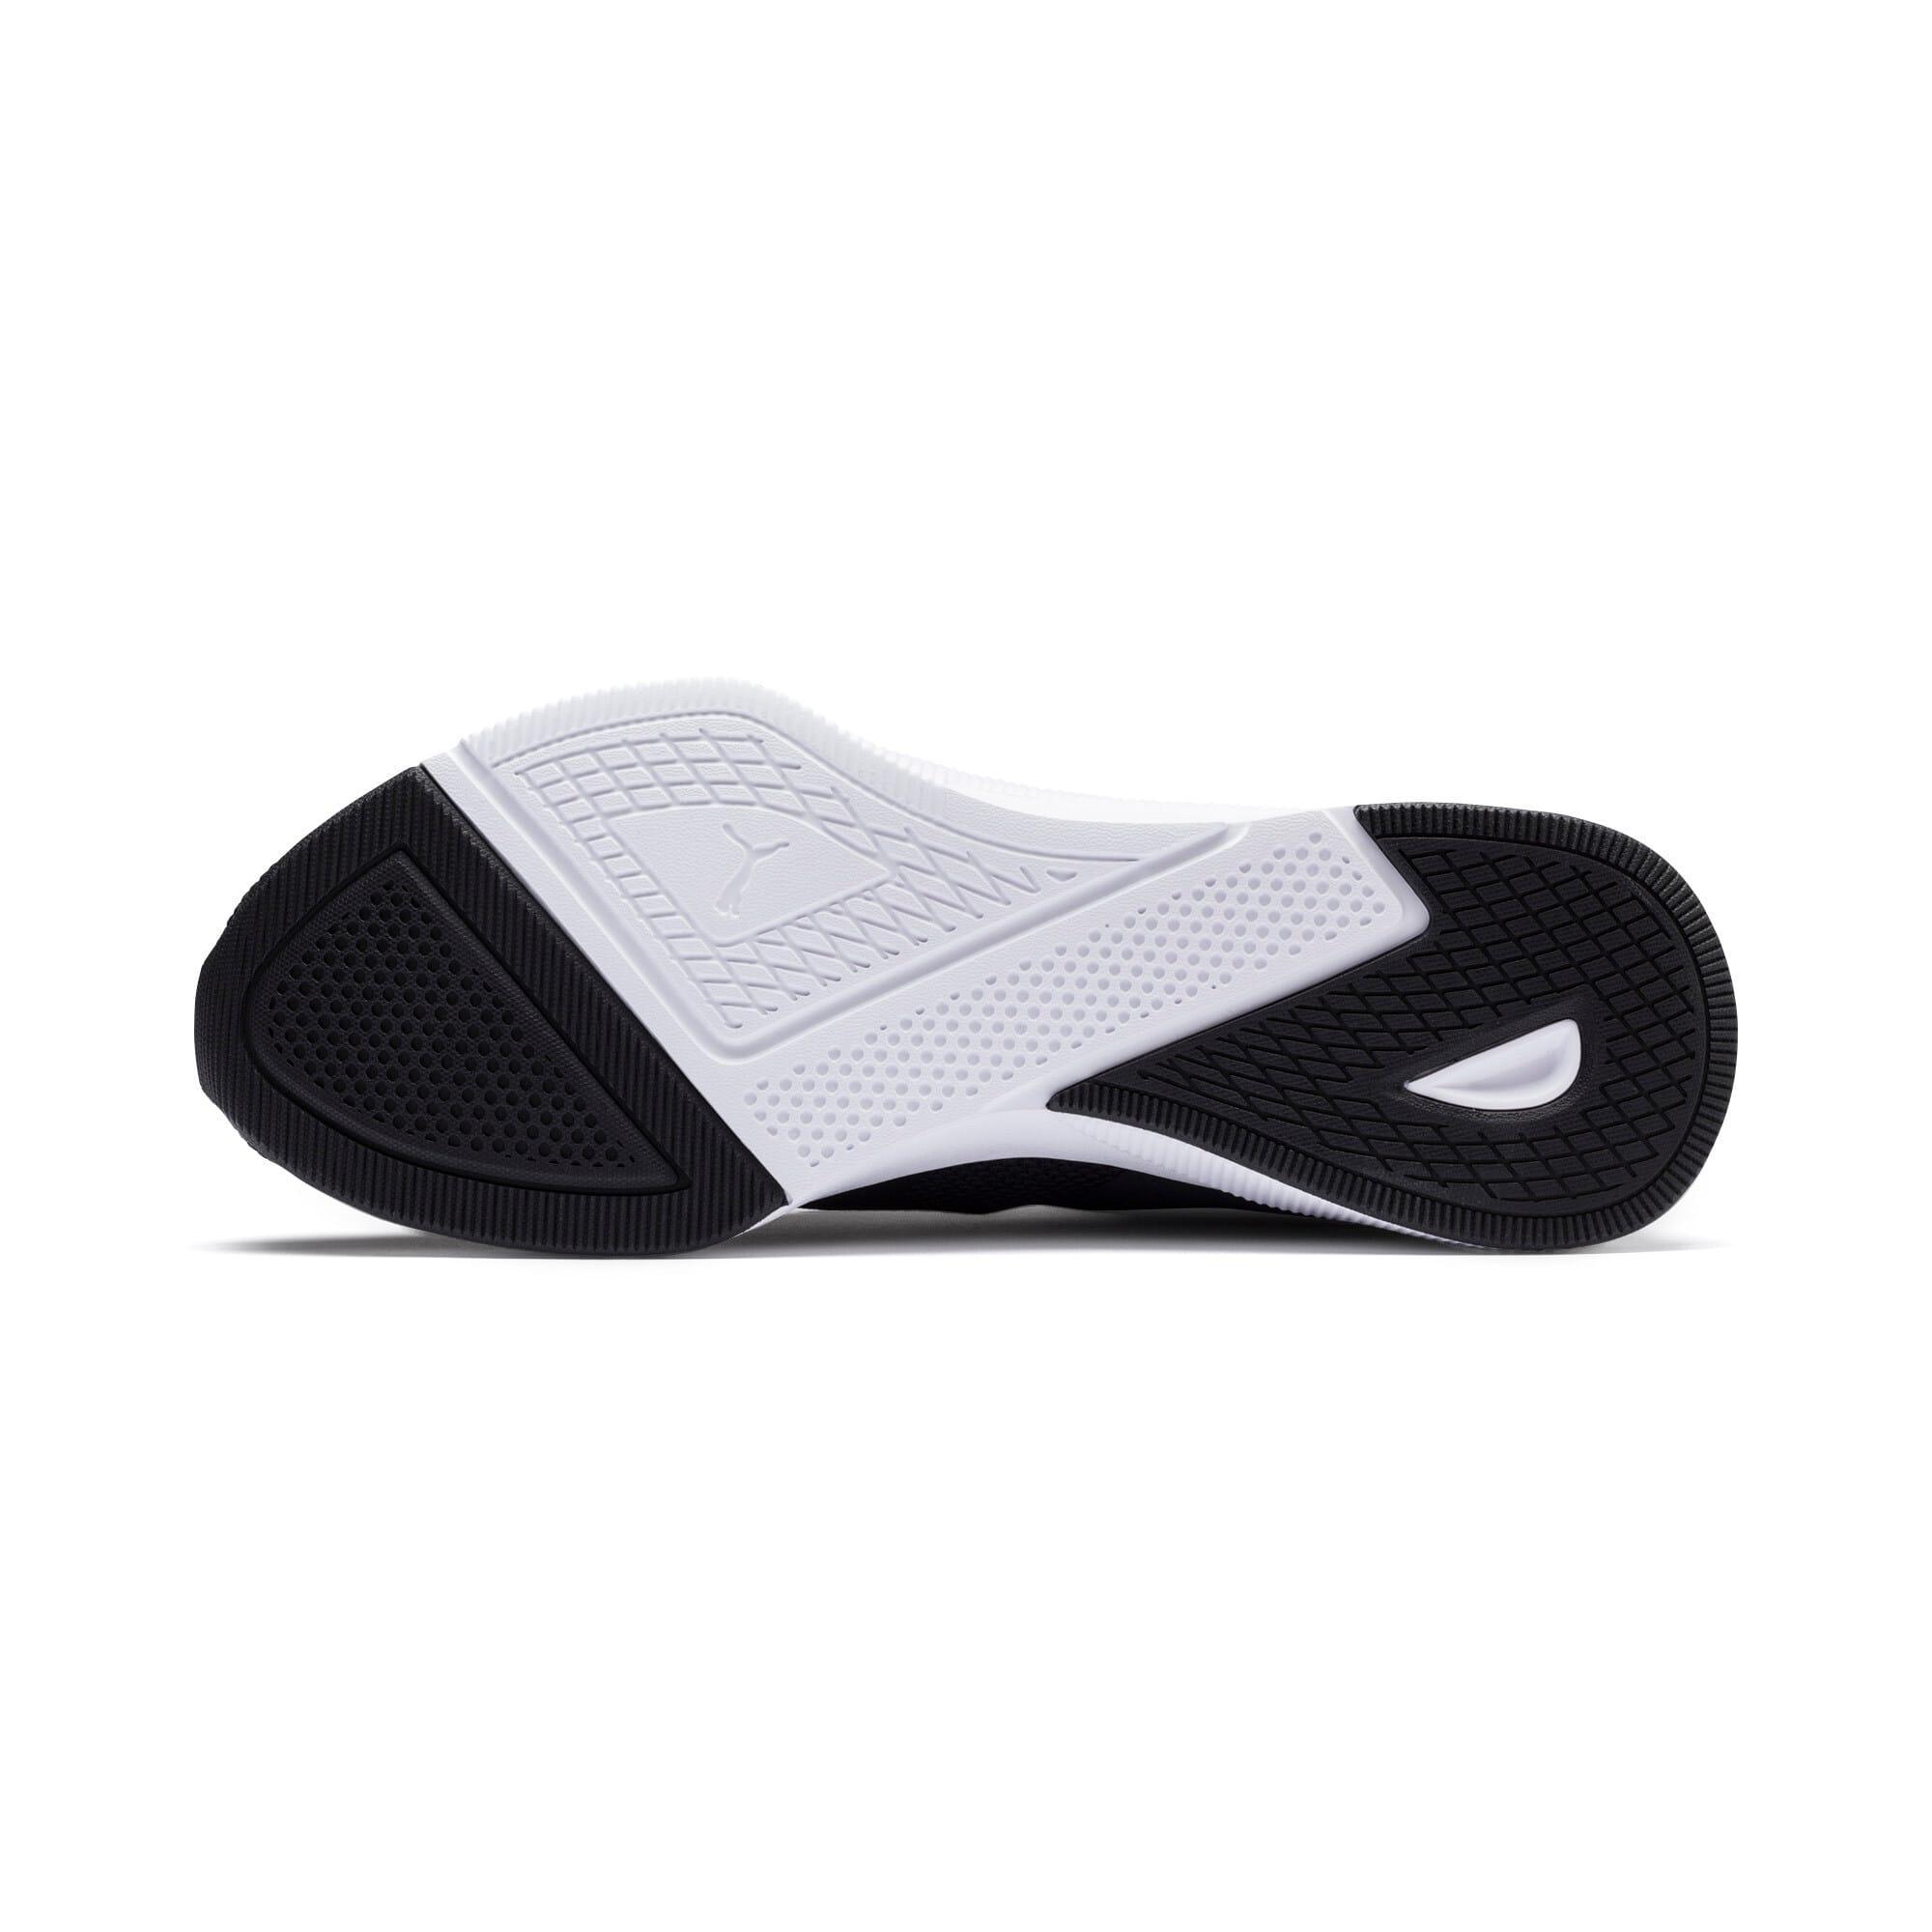 Thumbnail 4 of Flyer Running Shoes, Black-Black-White, medium-IND